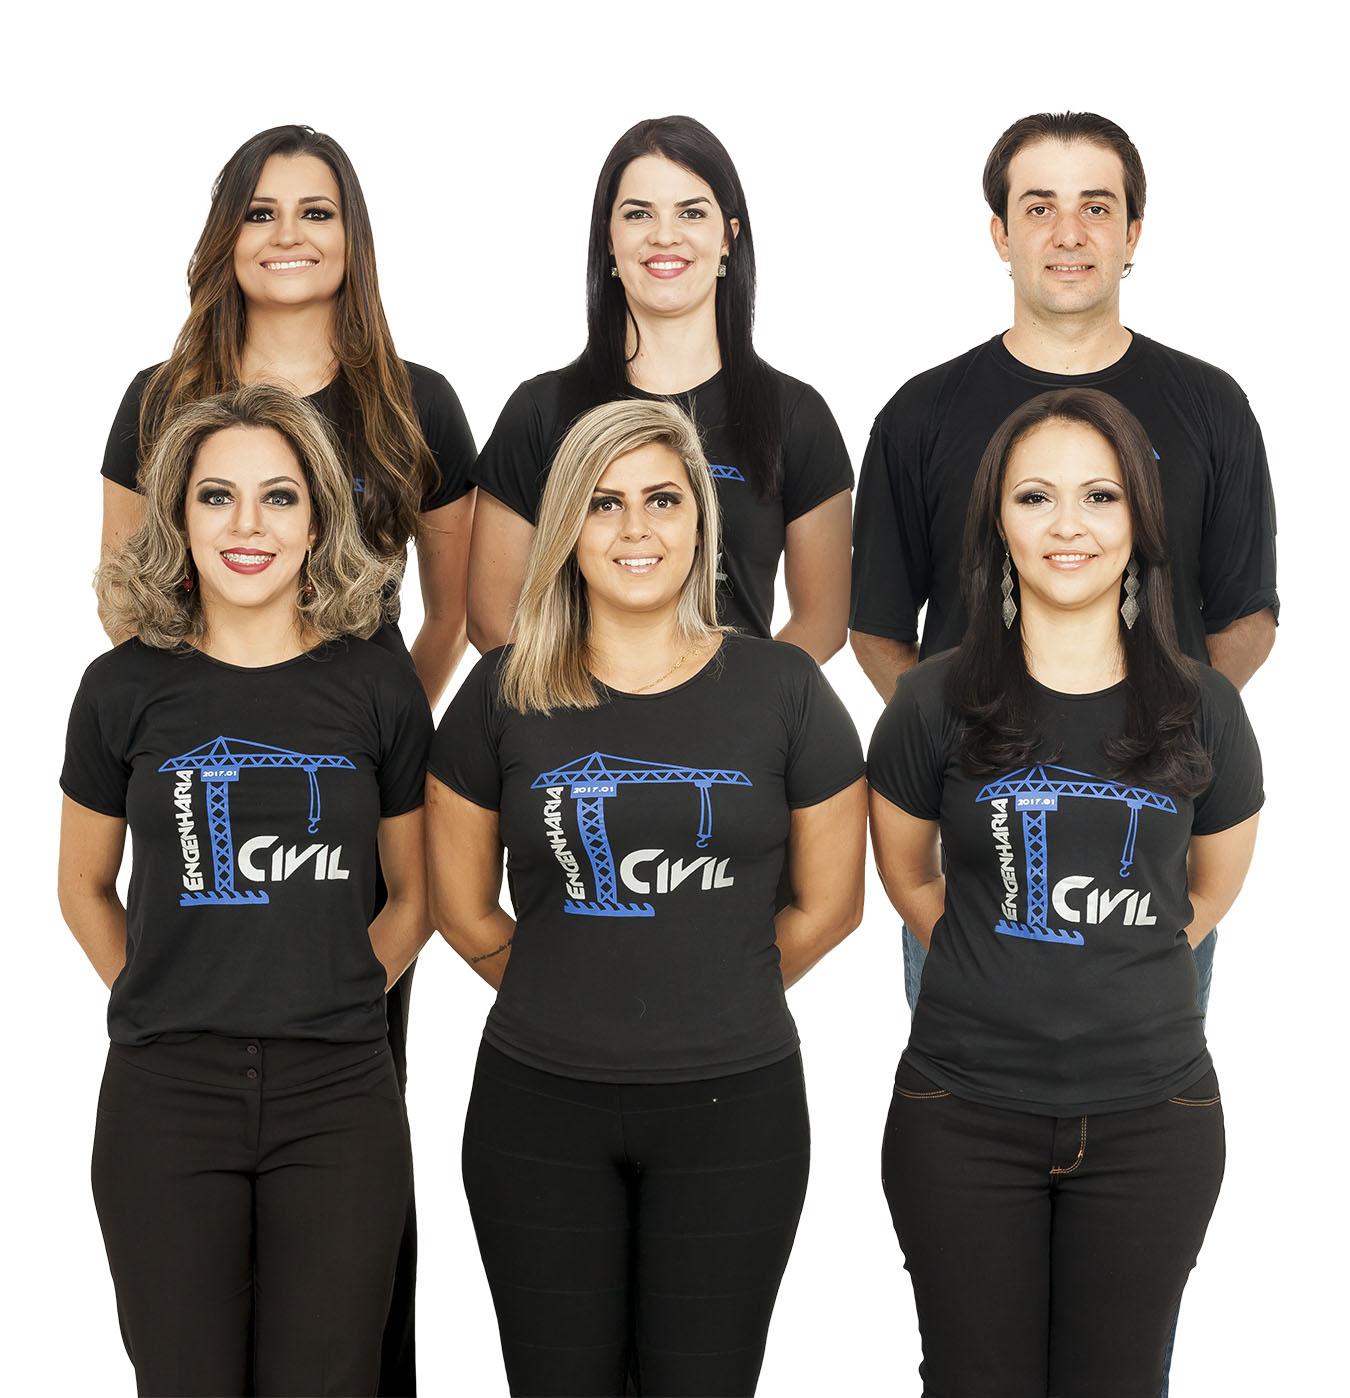 engenharia-civil-grupo-formatura